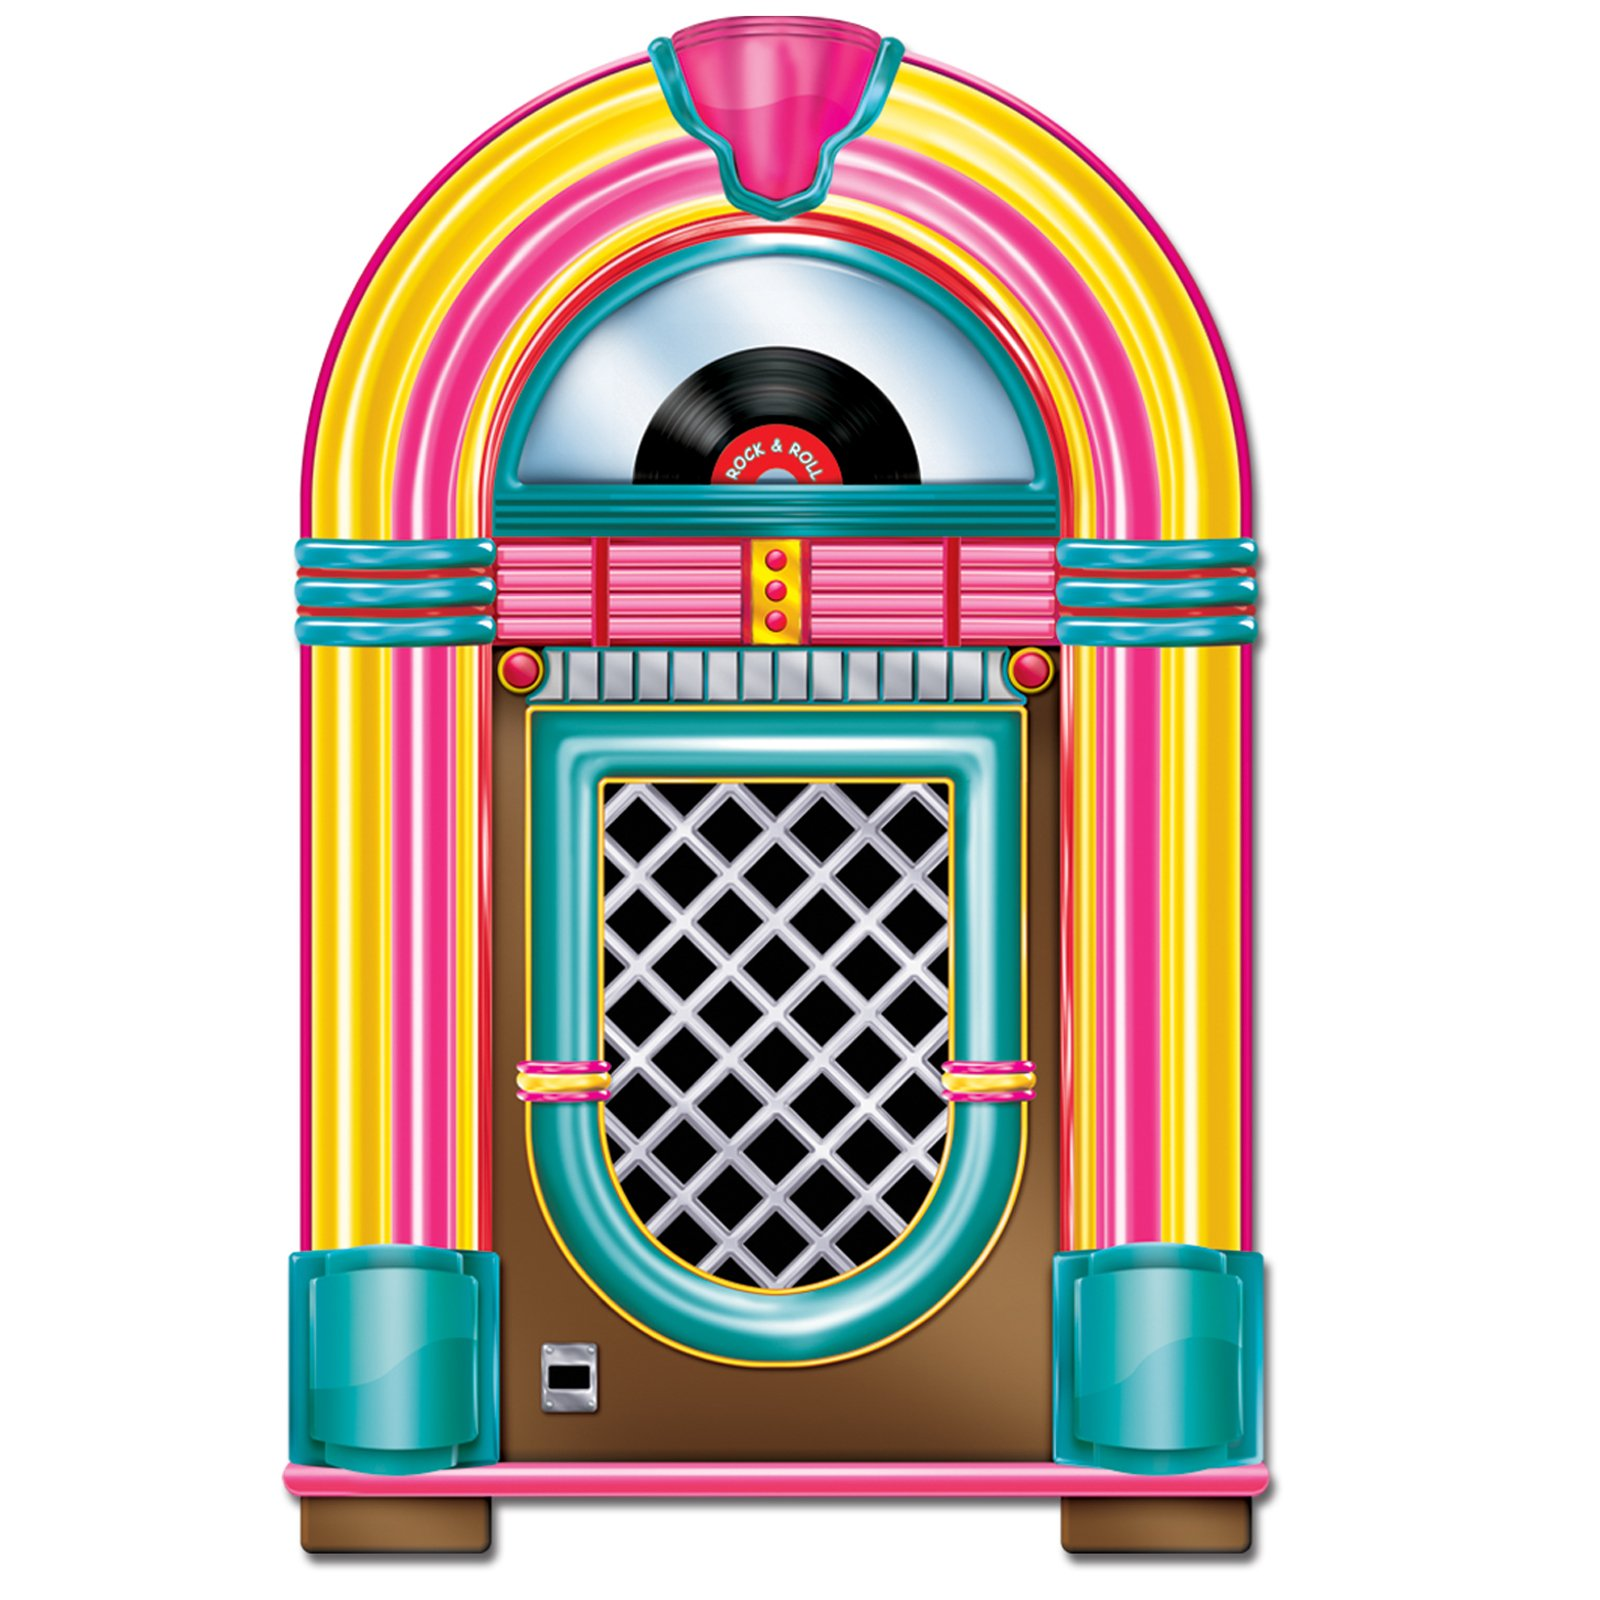 Jukebox Clipart & Jukebox Clip Art Images.